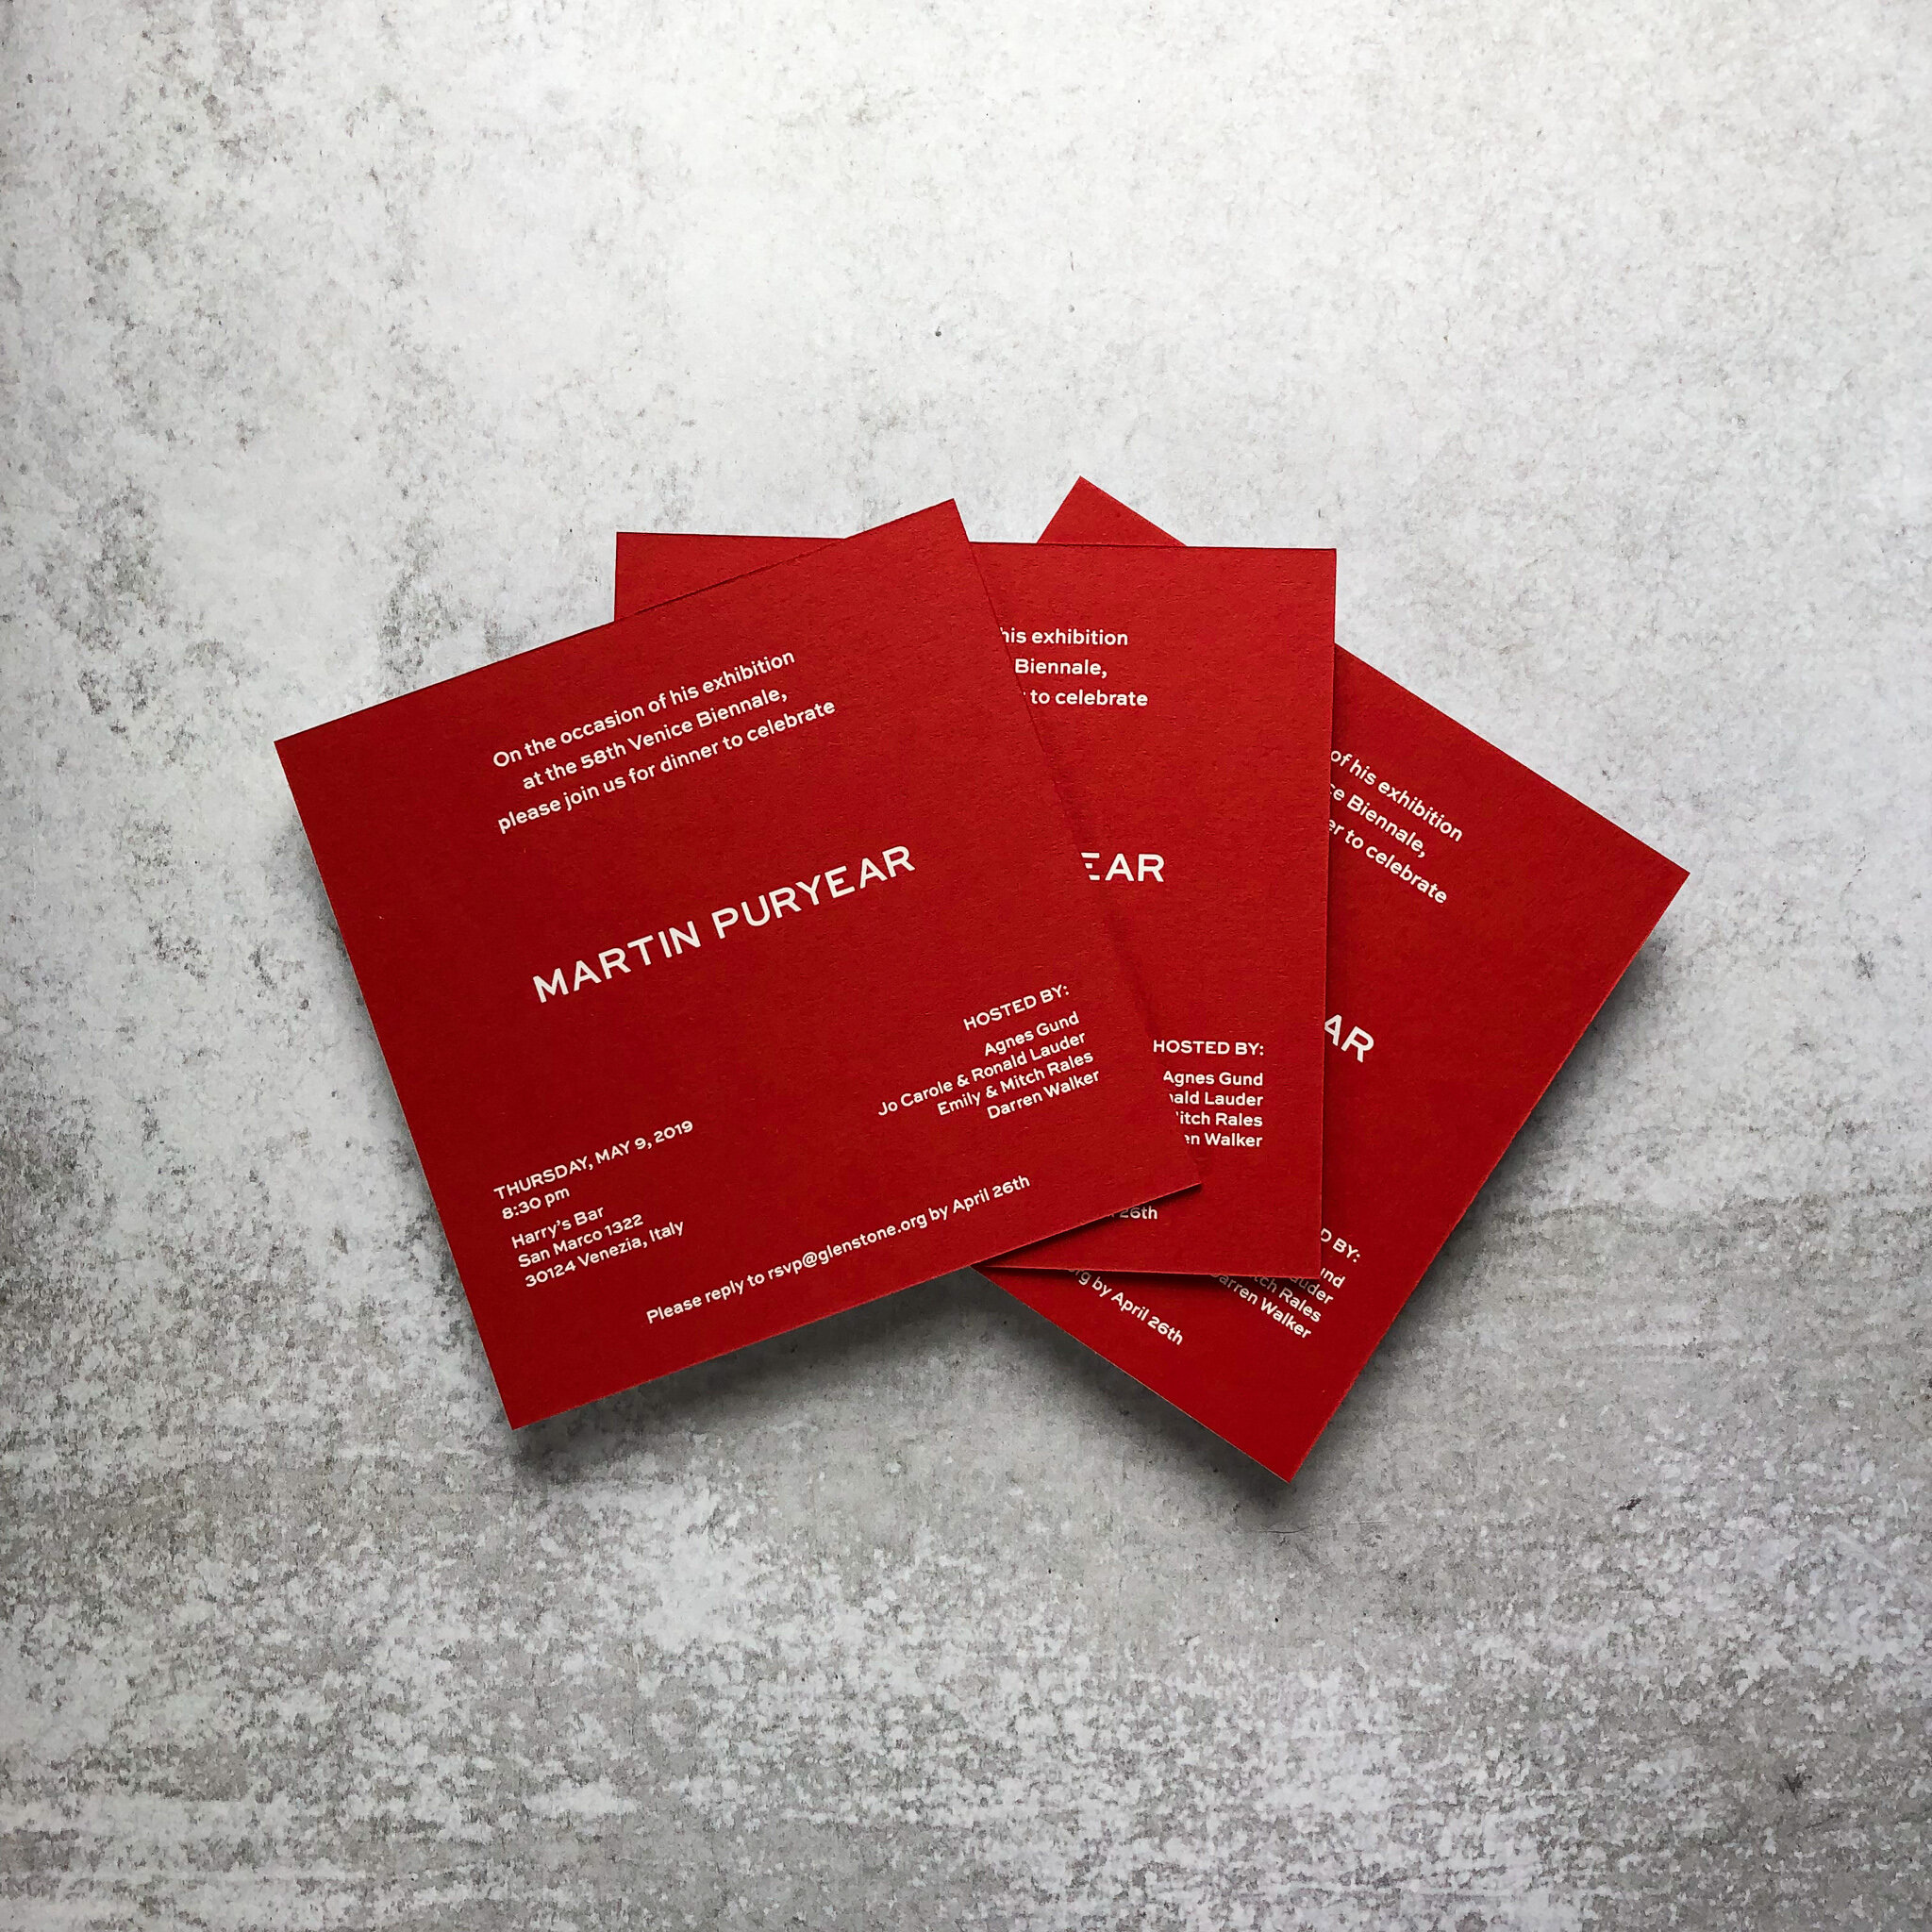 White Foil Stamping on Red Paper. Digital Printing shown on Envelopes.